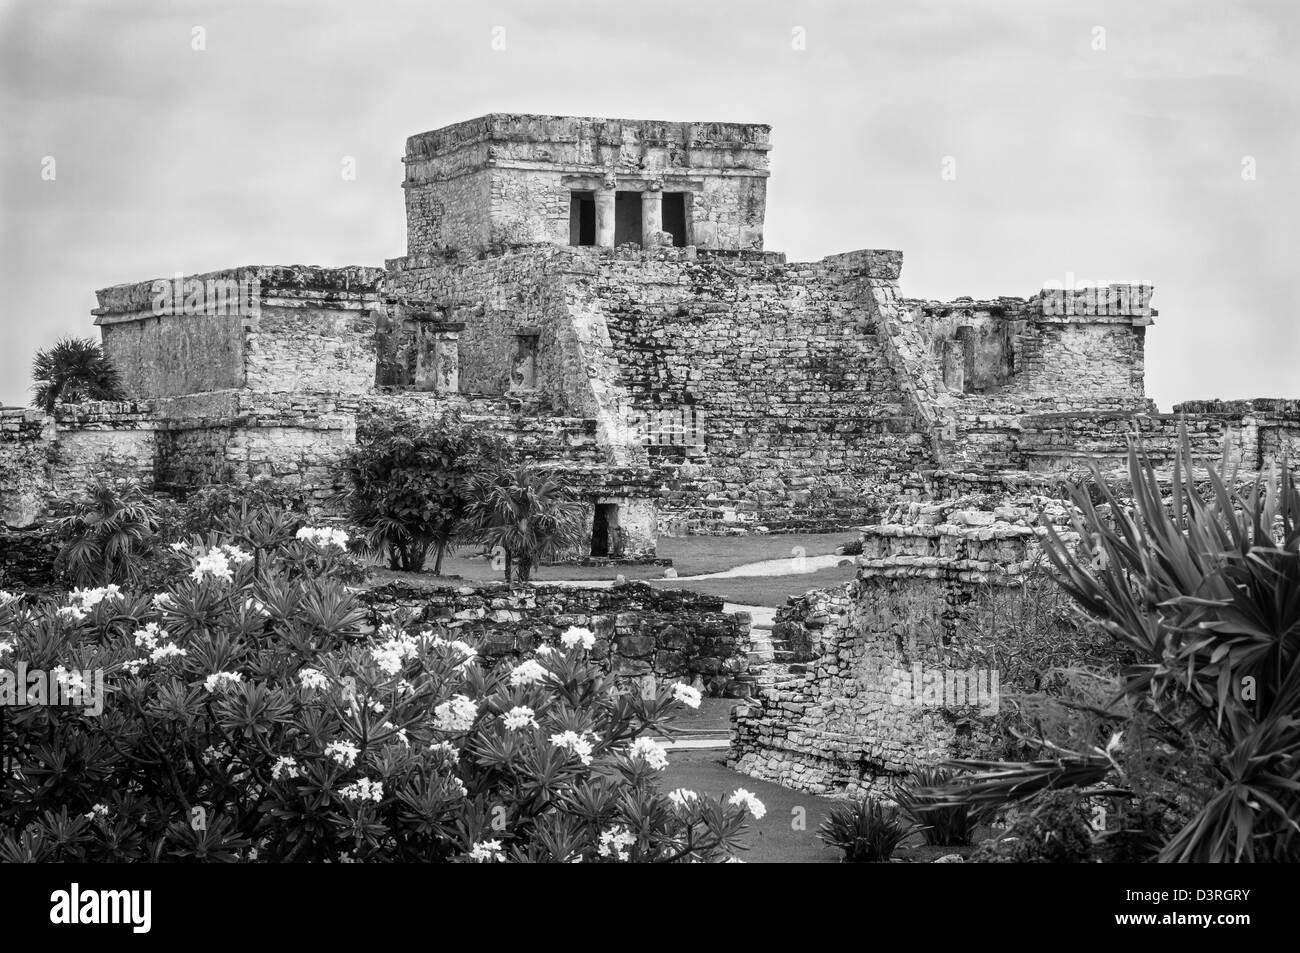 El Castillo at Tulum Maya ruins, Yucatan Peninsula, Mexico. - Stock Image